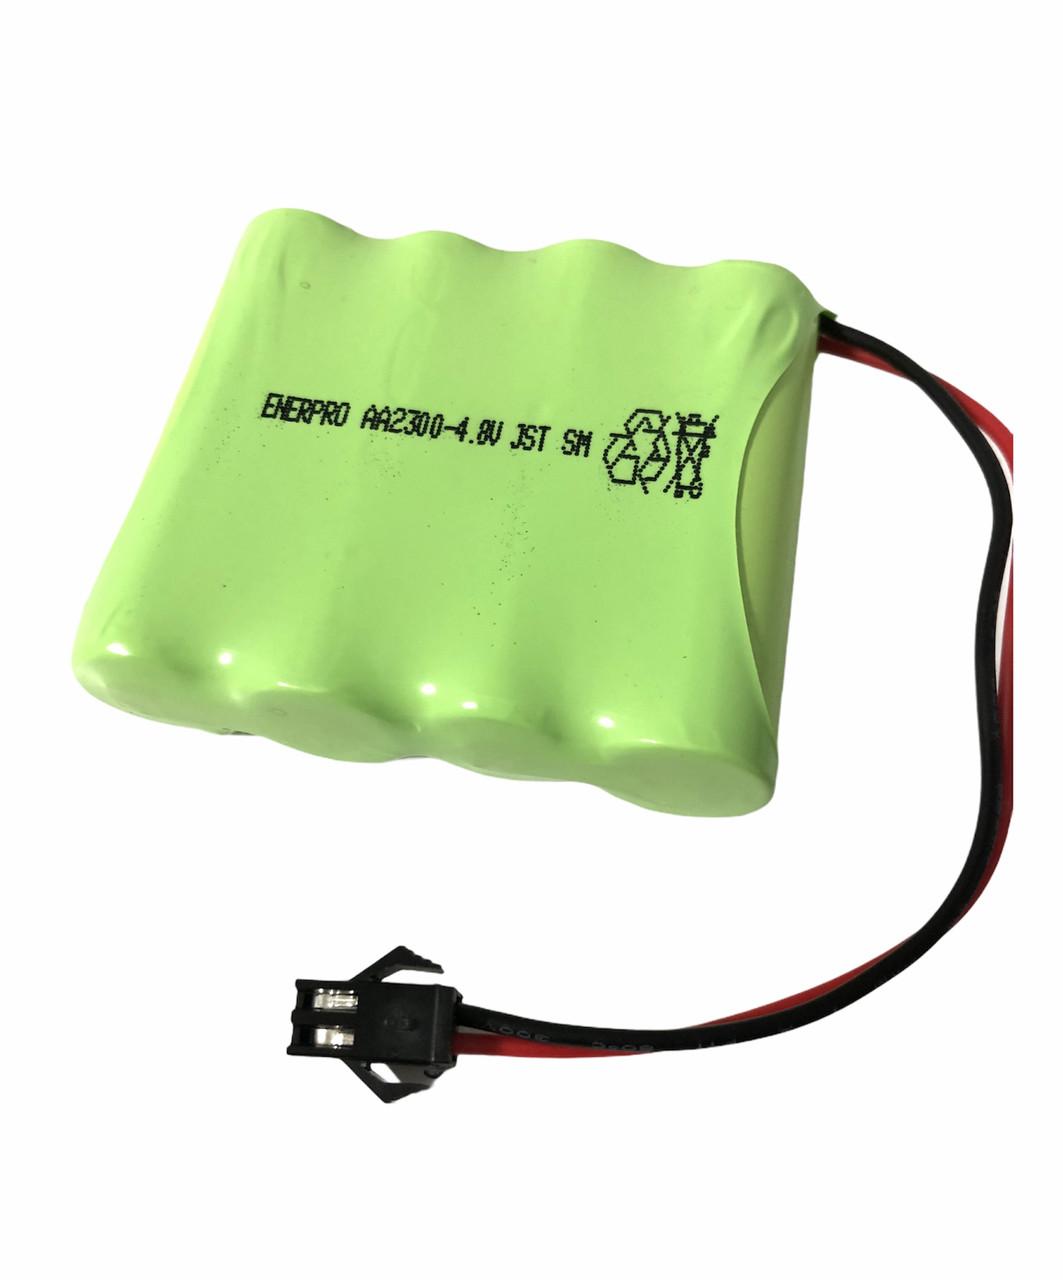 Аккумулятор AA2300 4 8v Ni-Mh до дитячих іграшок